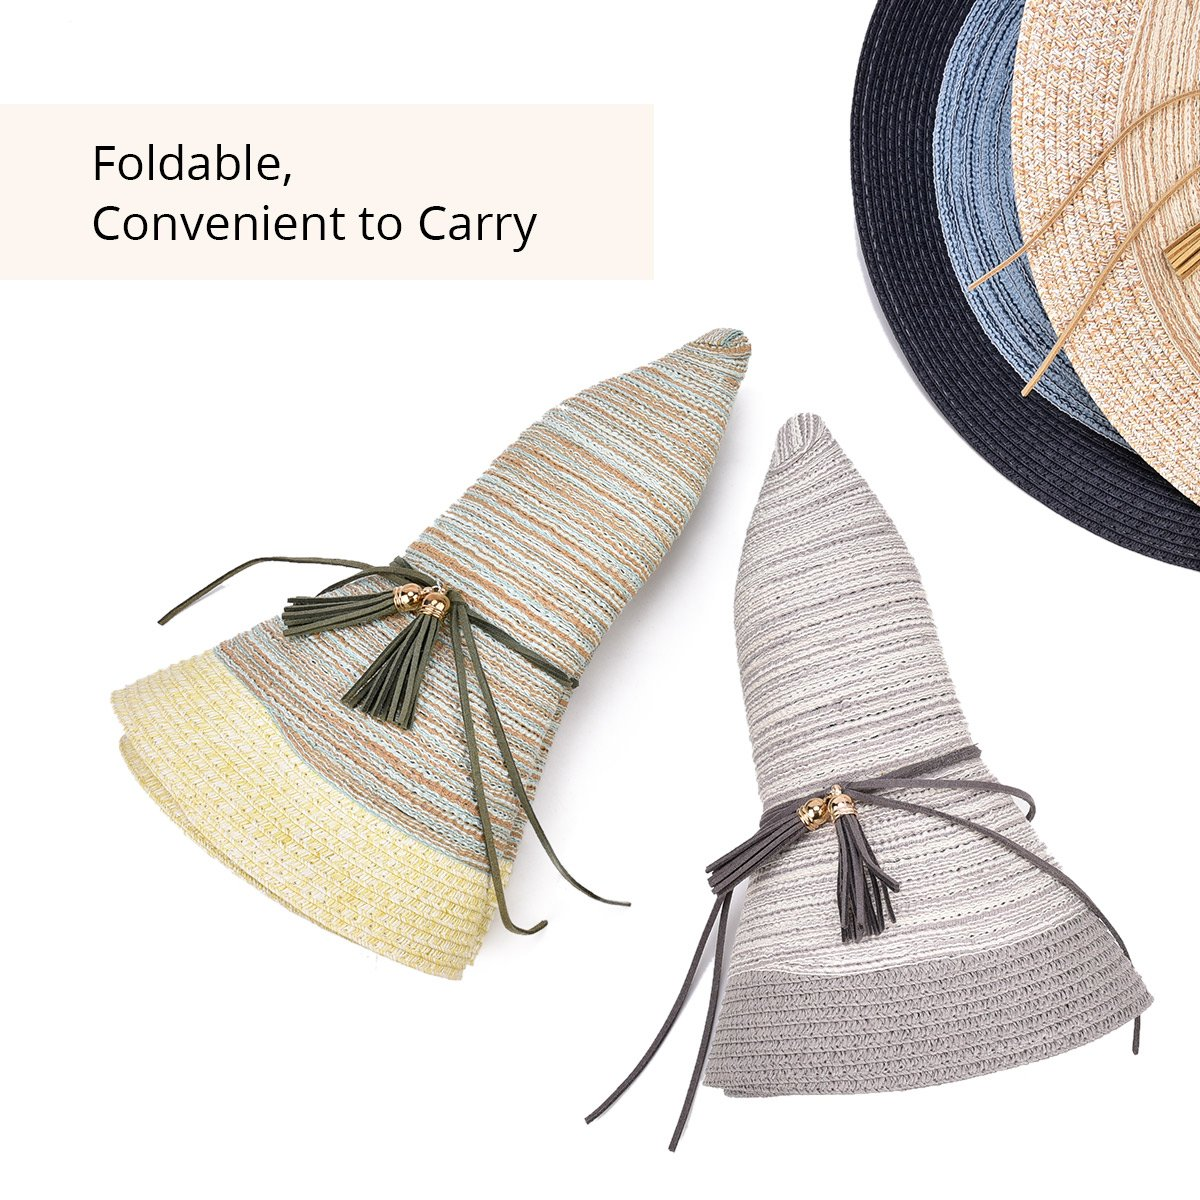 SOMALER Women Floppy Sun Hat Summer Wide Brim Beach Cap Packable Cotton Straw Hat for Travel by SOMALER (Image #6)